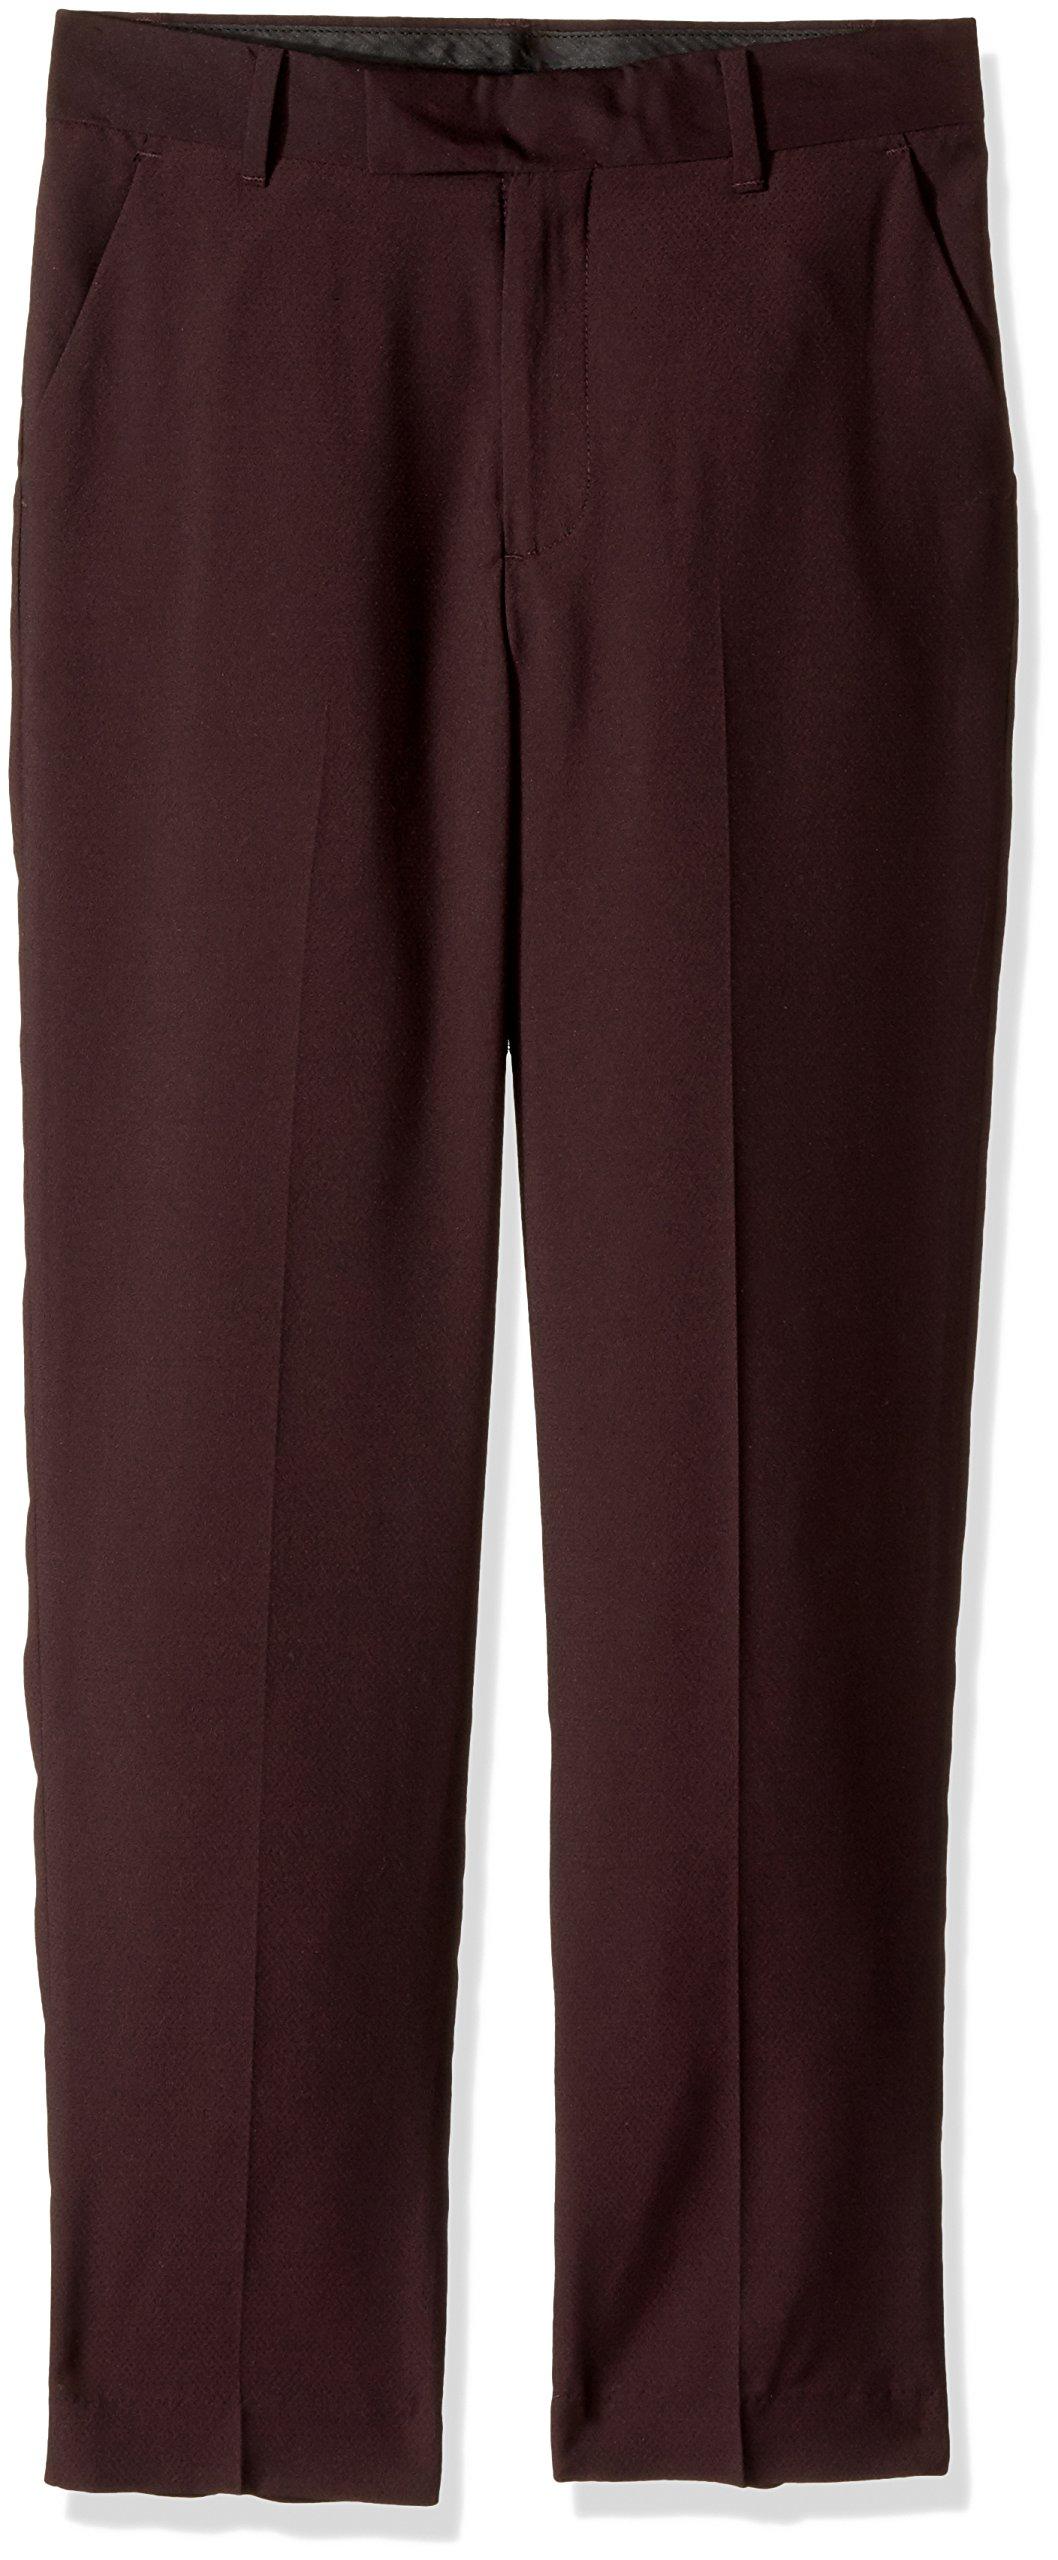 Calvin Klein Big Boys' Flat Front Dress Pant, Square Burgundy, 16